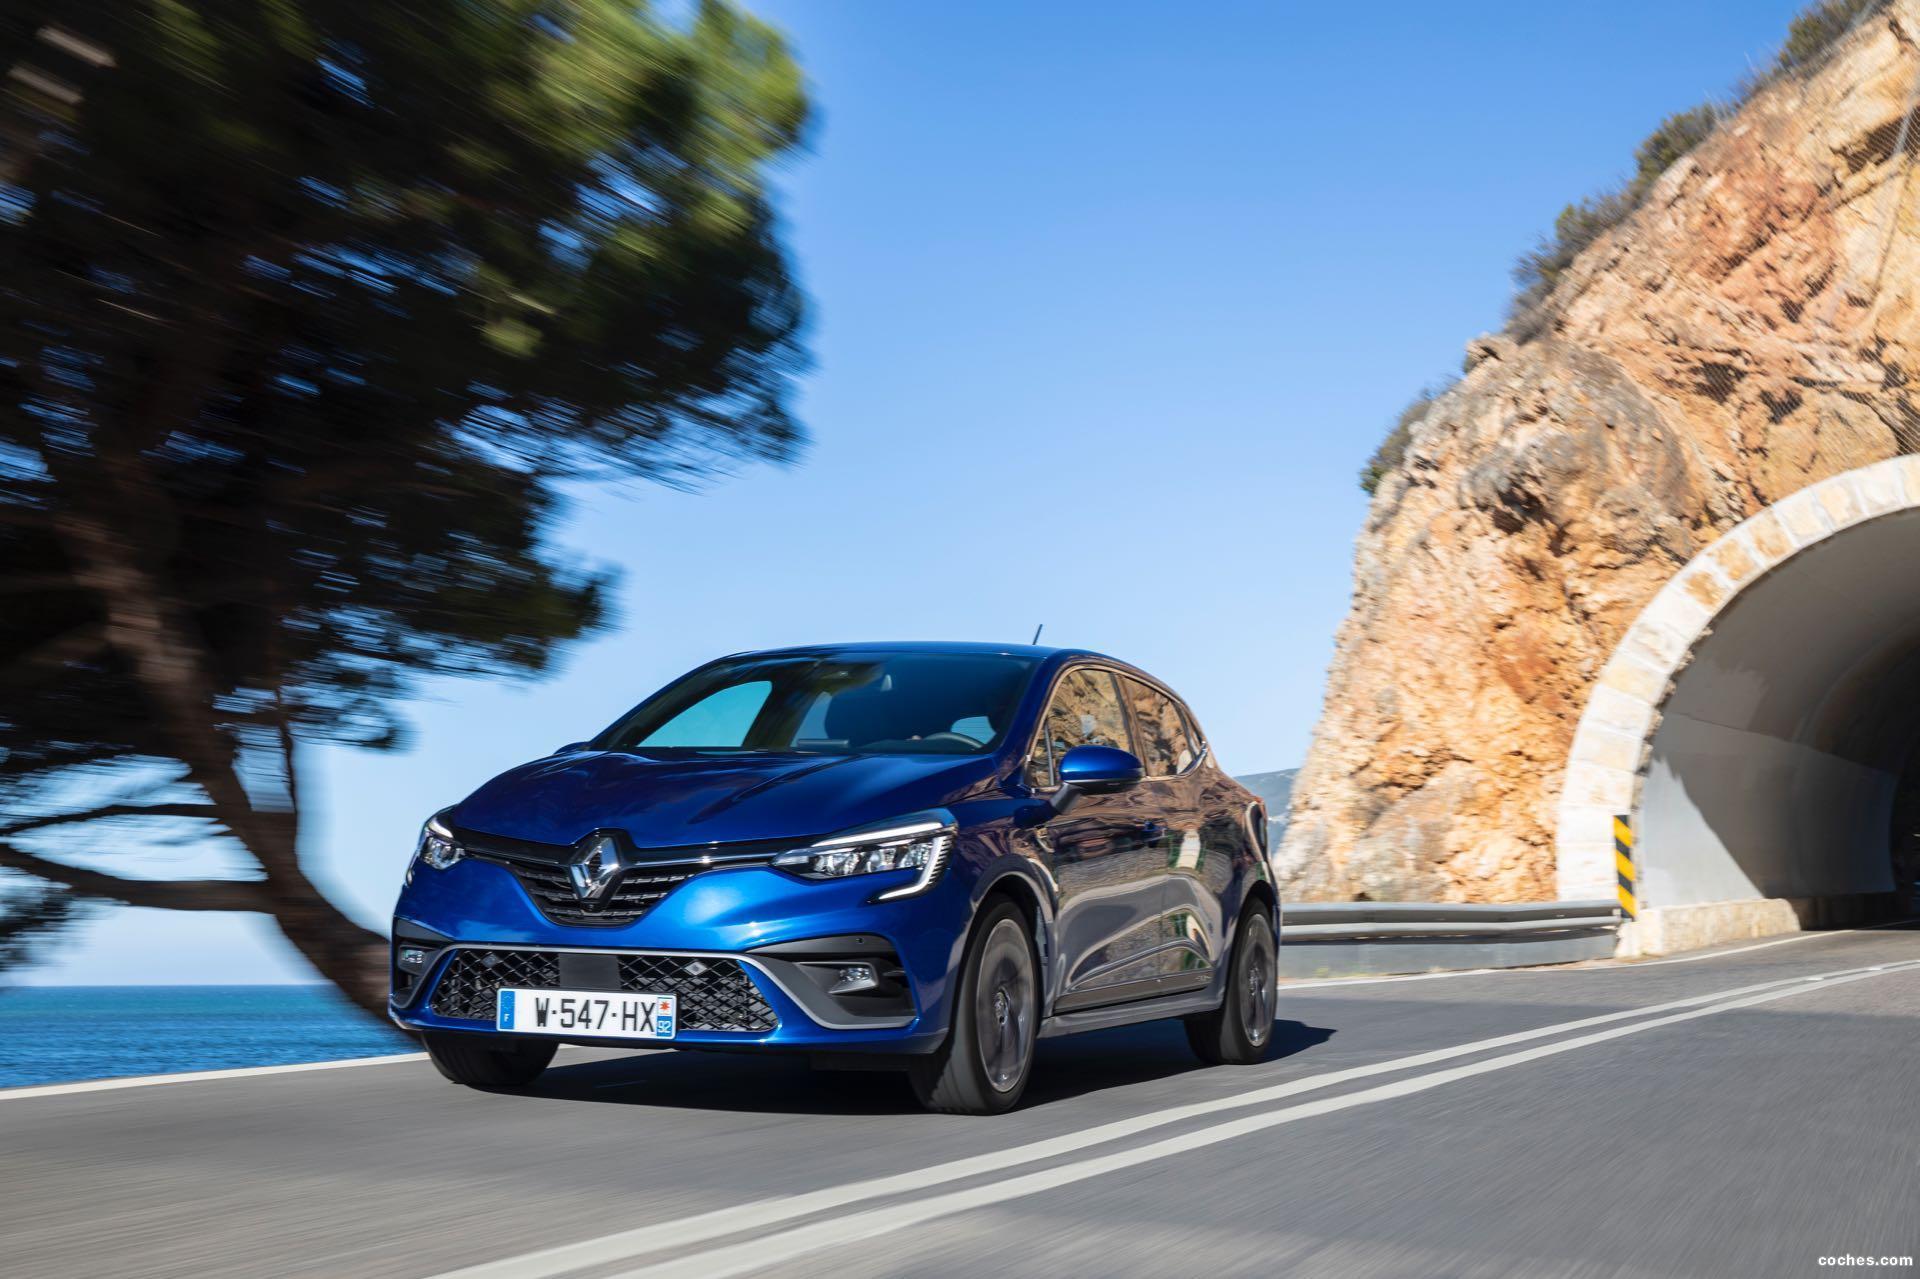 Foto 14 de Renault Clio R.S. Line 2019